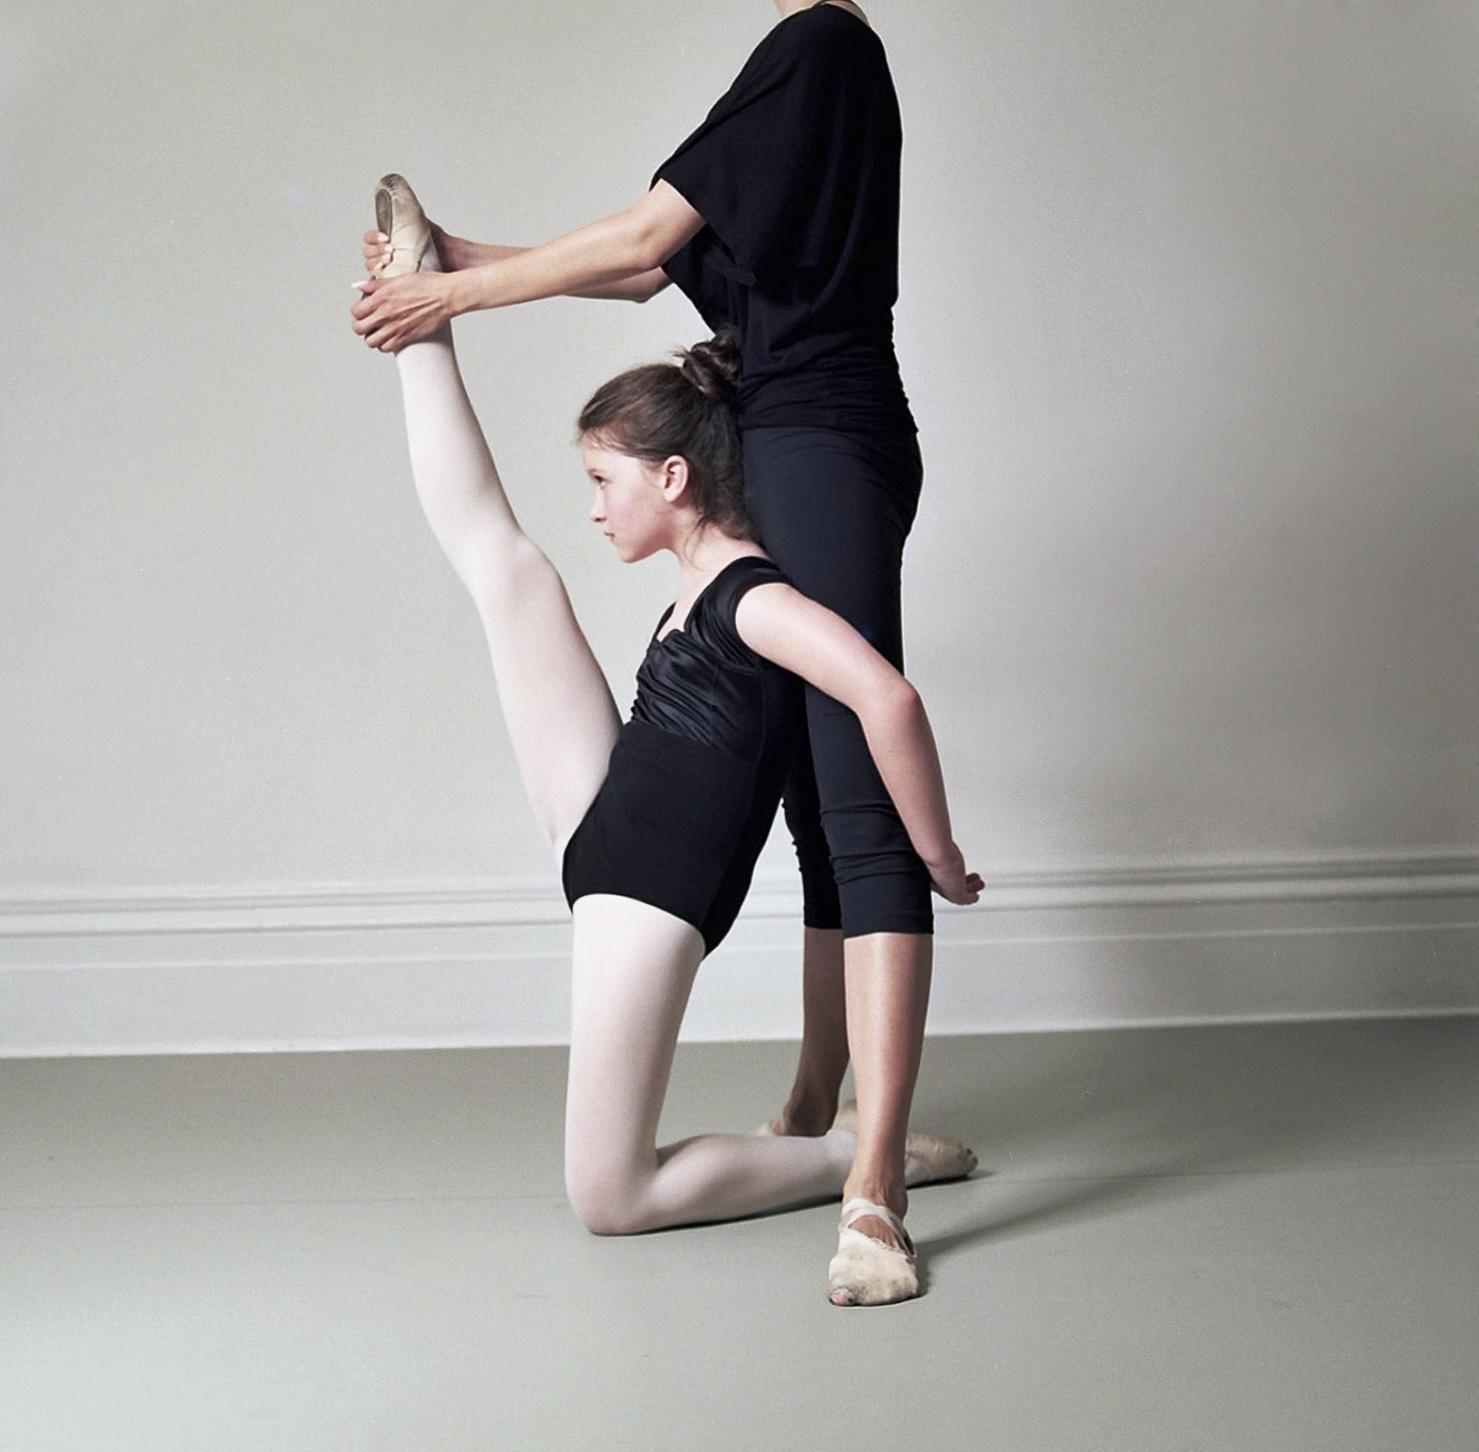 Irina and Sophie